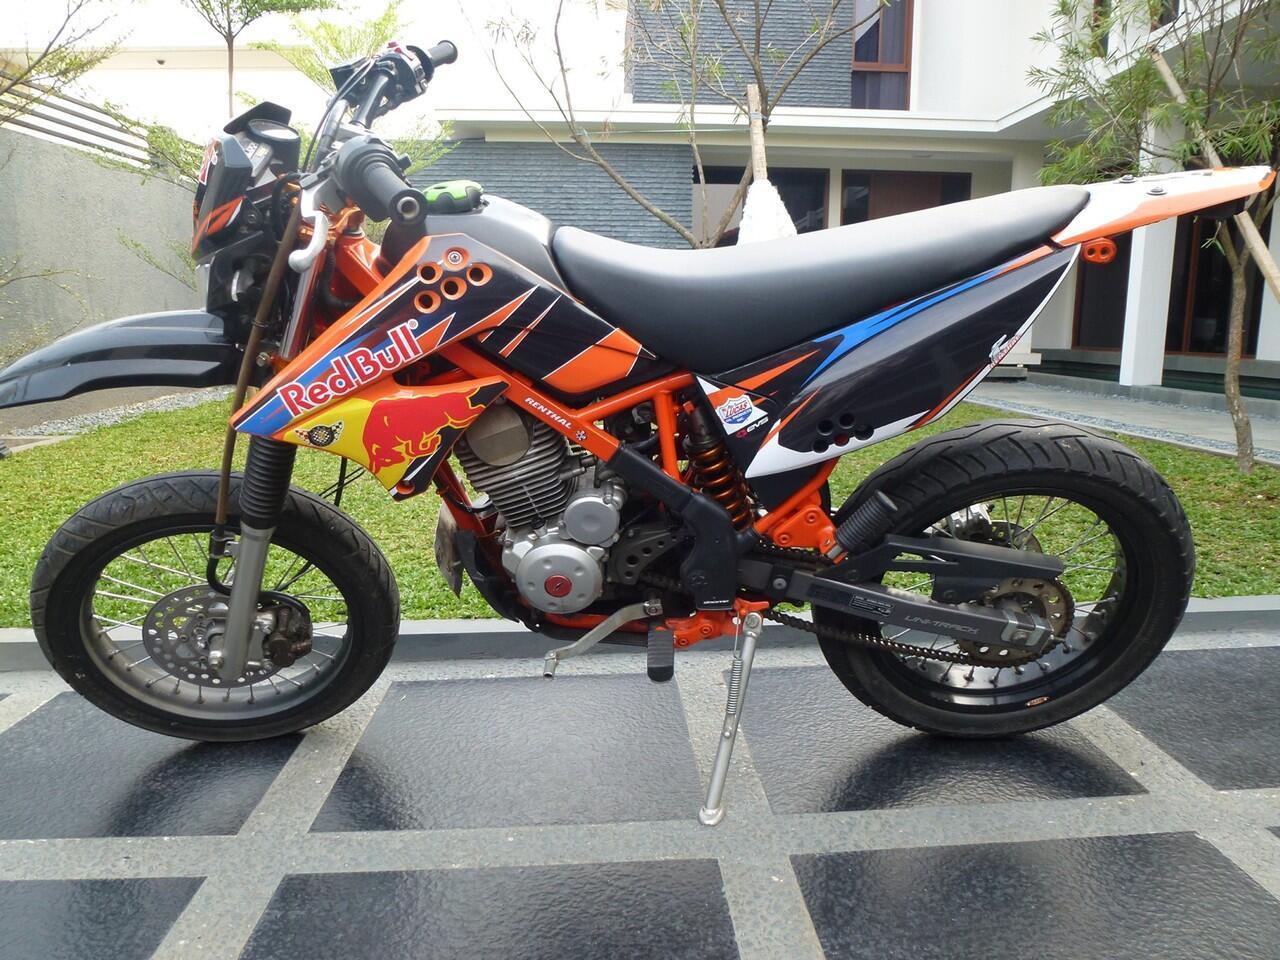 Cari Jual Kawasaki KLX 150 D Tracker Modif Supermoto 2011 KASKUS